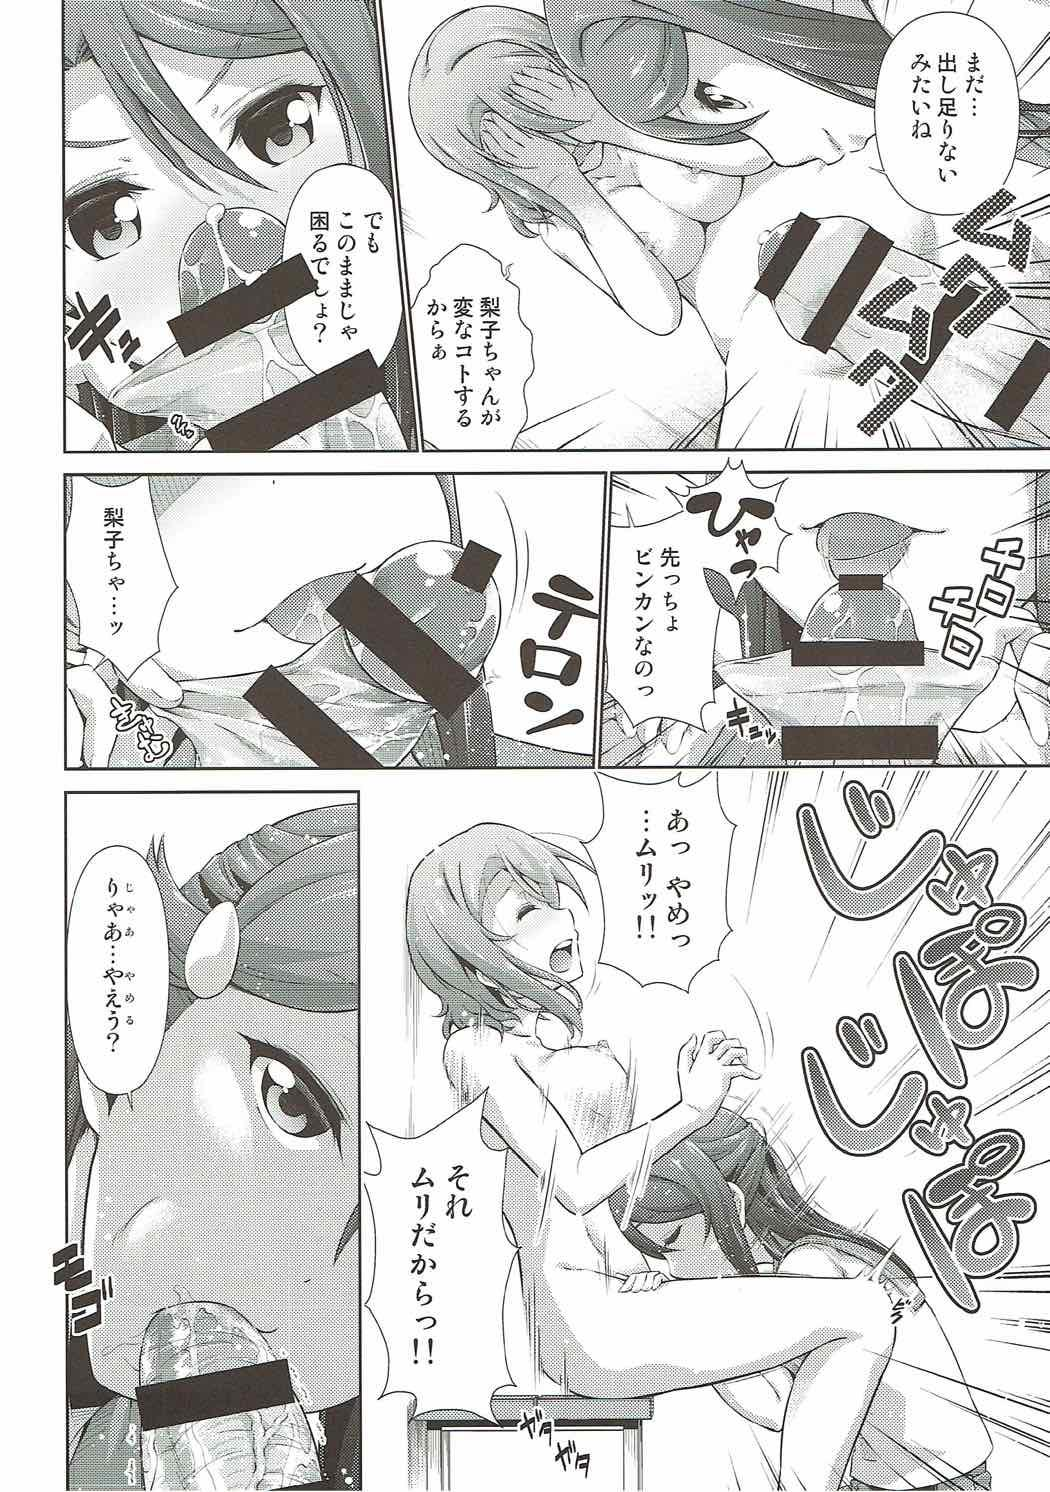 Chika-chan ni mo Naisho no Himitsu 32